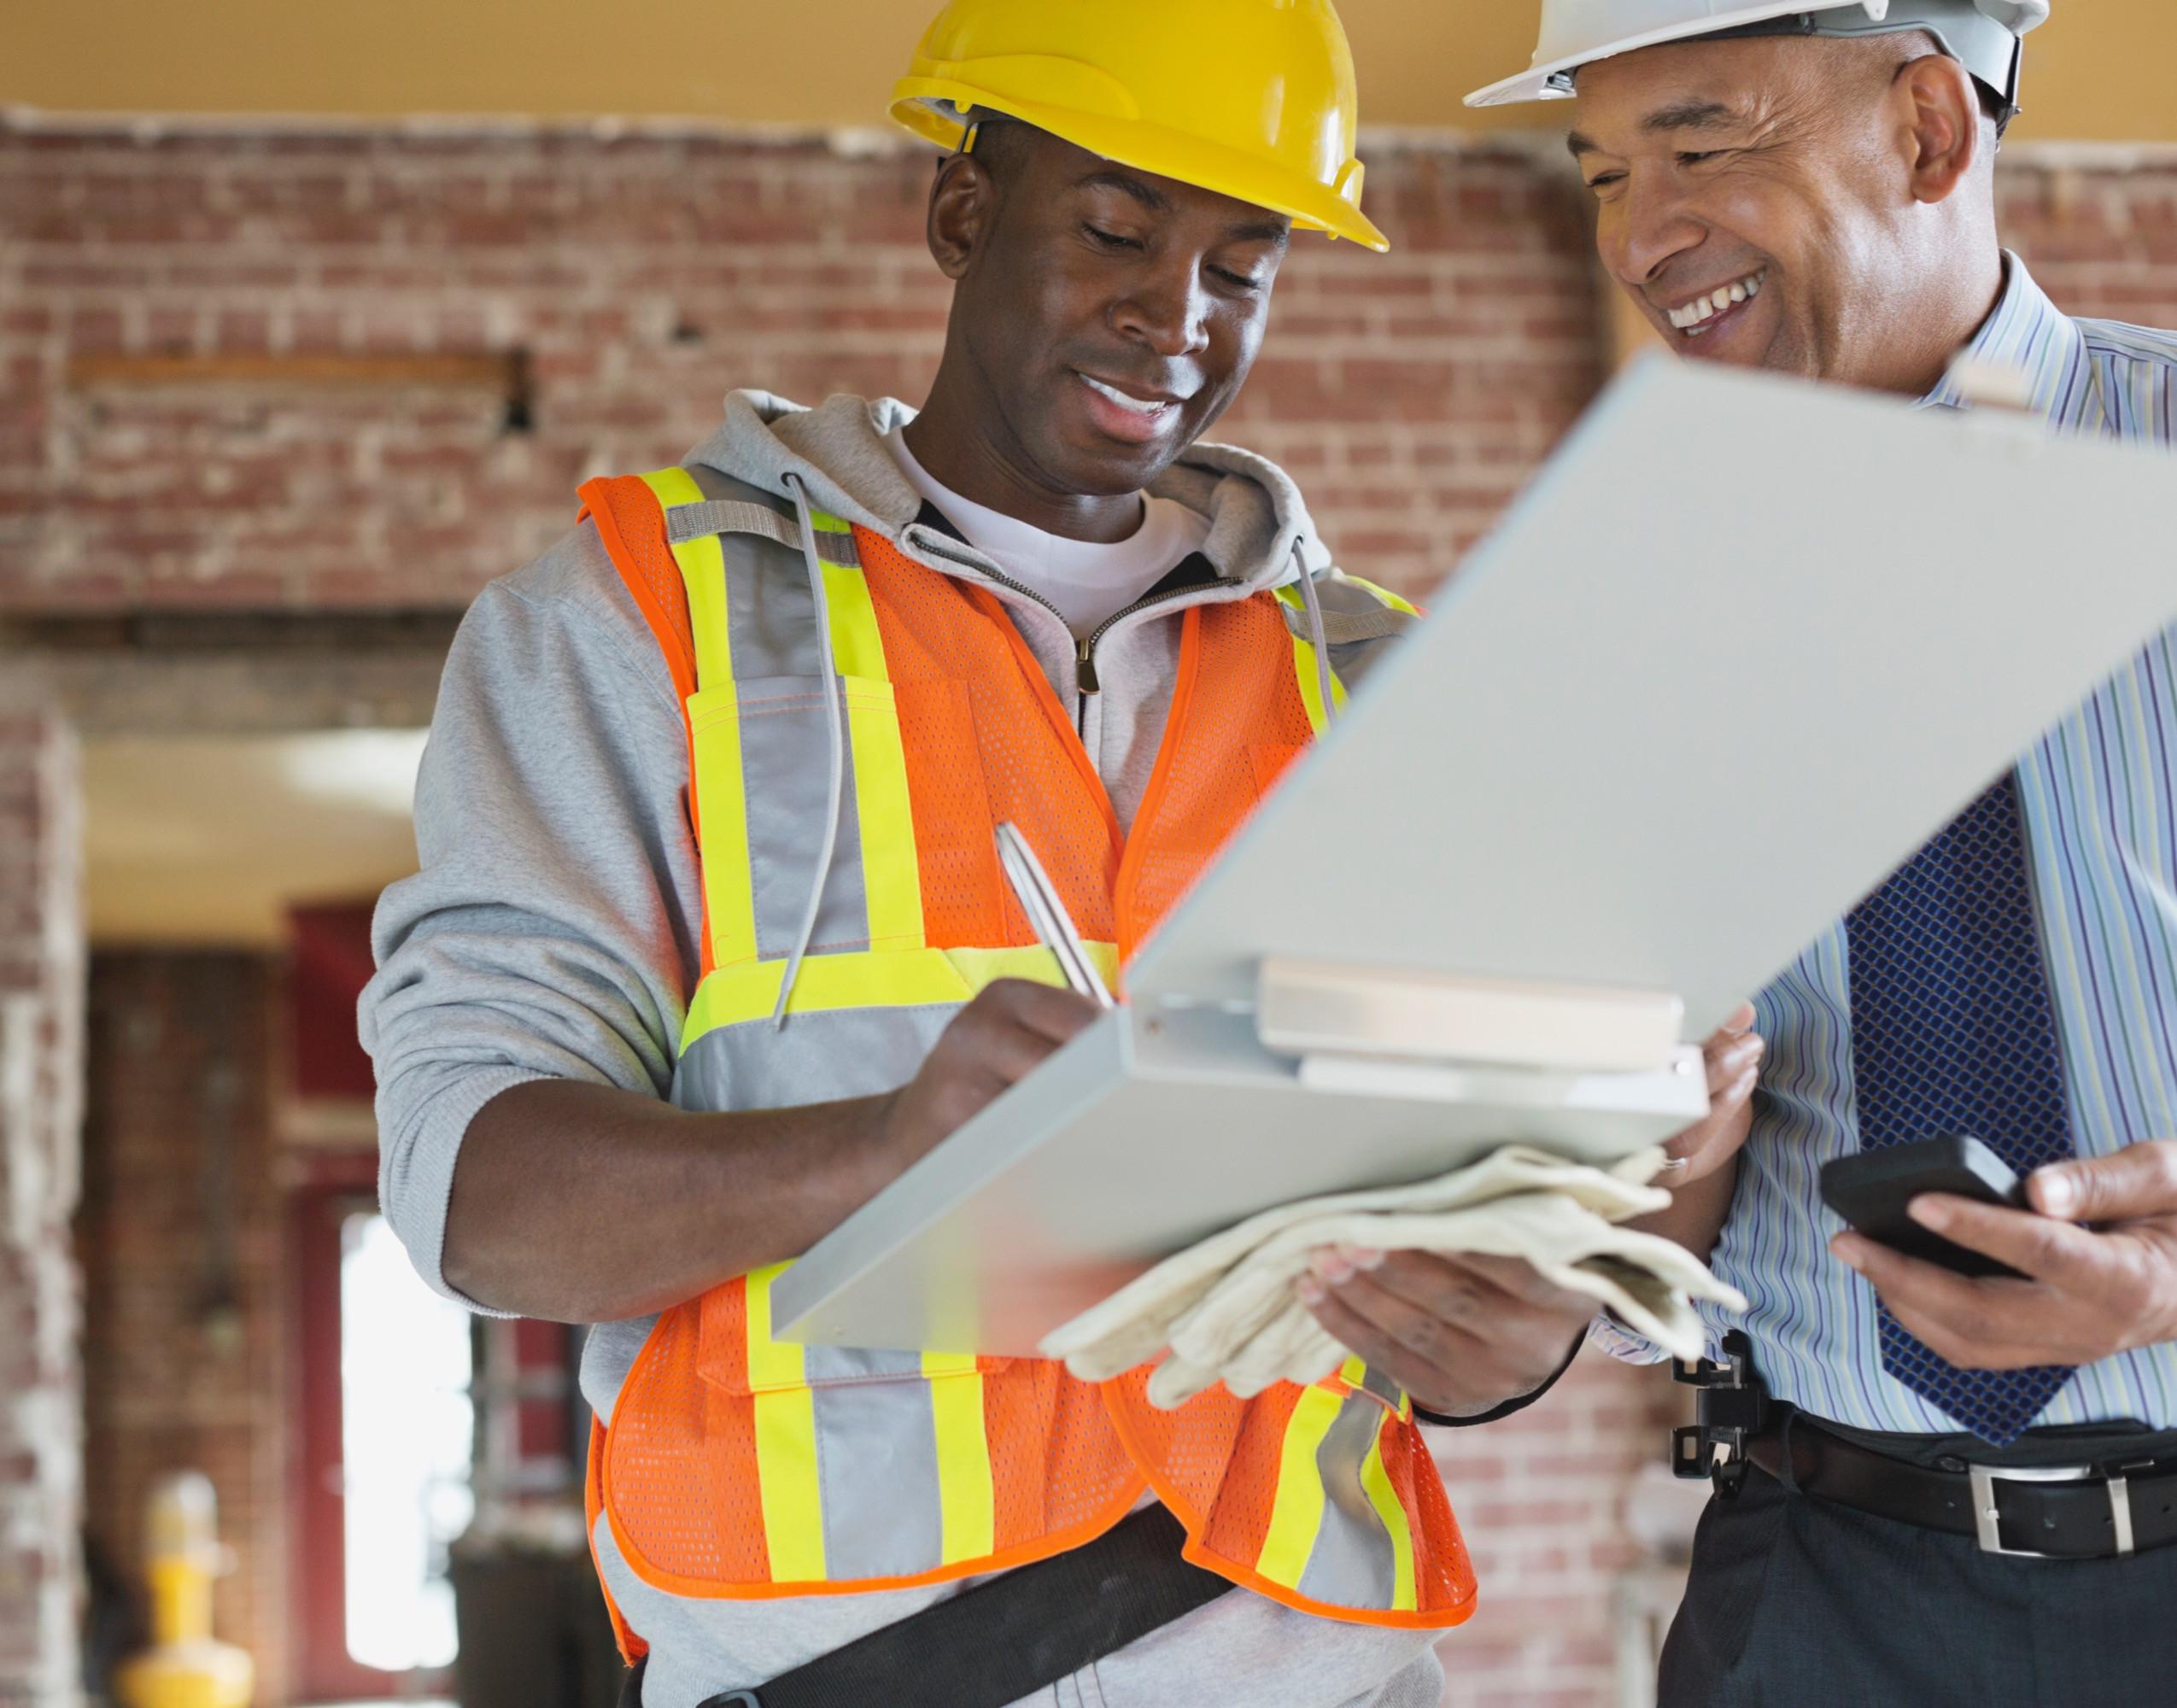 Worker's Compensation Consultation